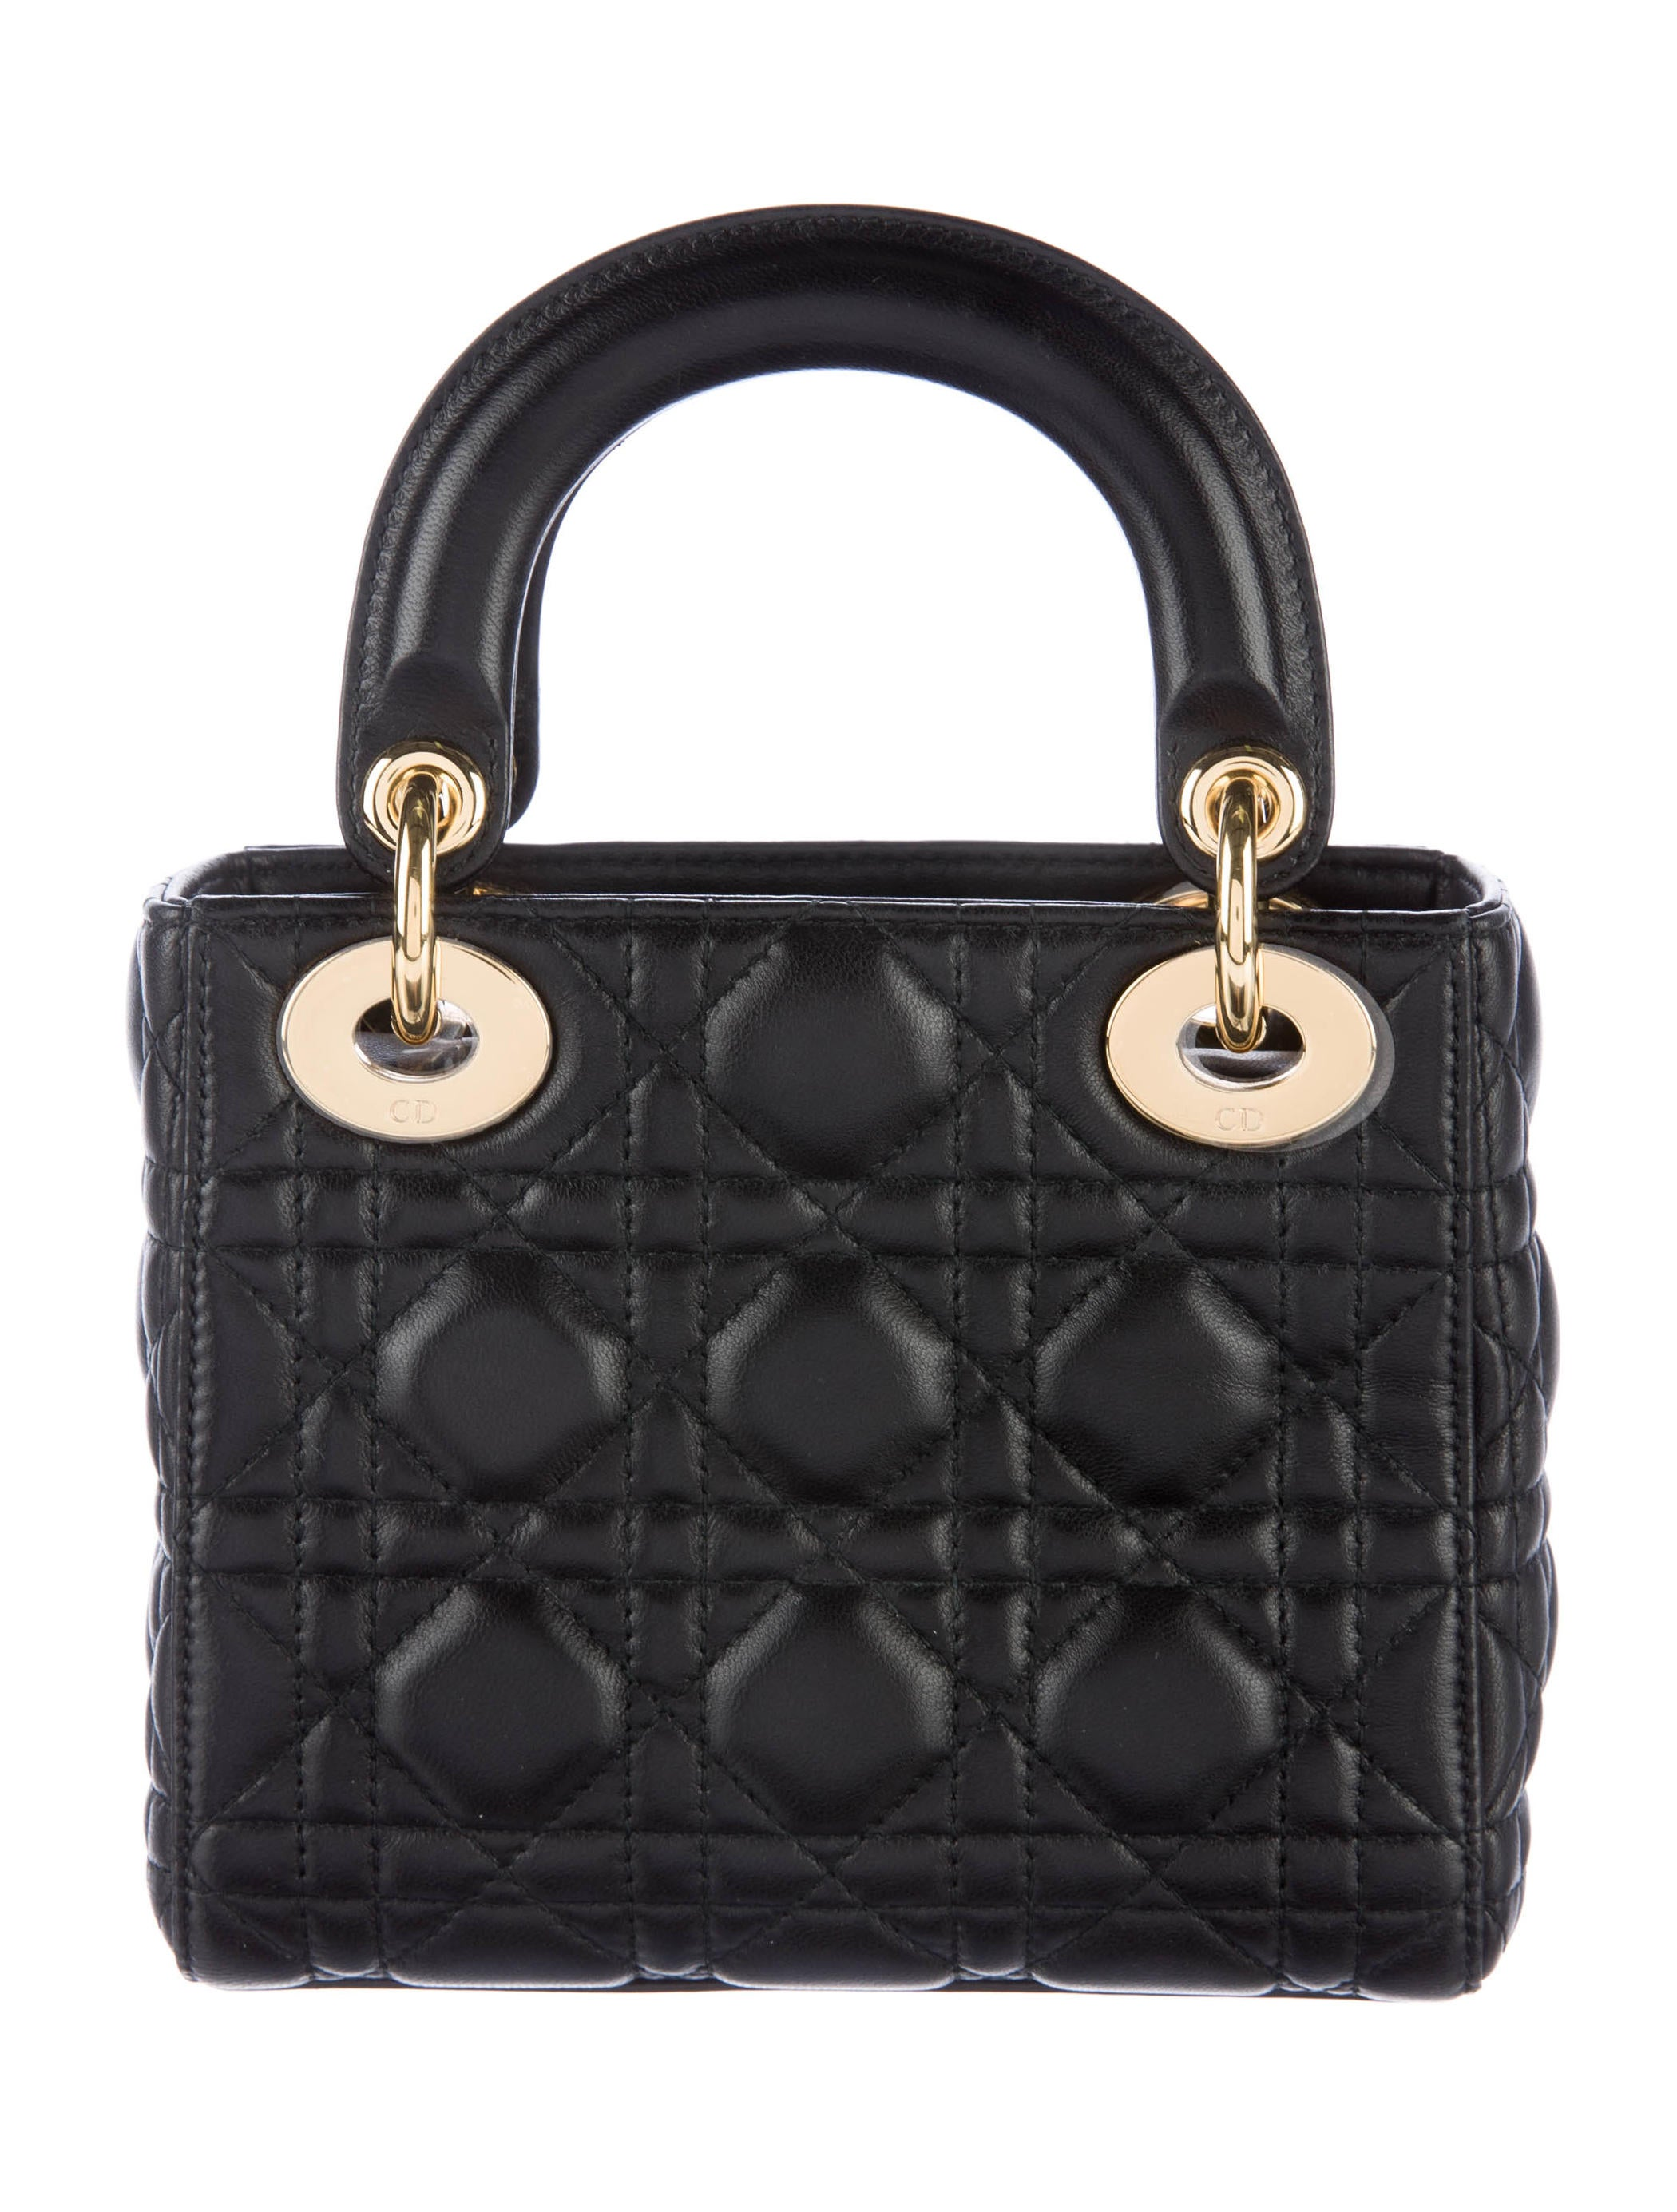 christian dior 2016 mini lady dior bag handbags chr55180 the realreal. Black Bedroom Furniture Sets. Home Design Ideas